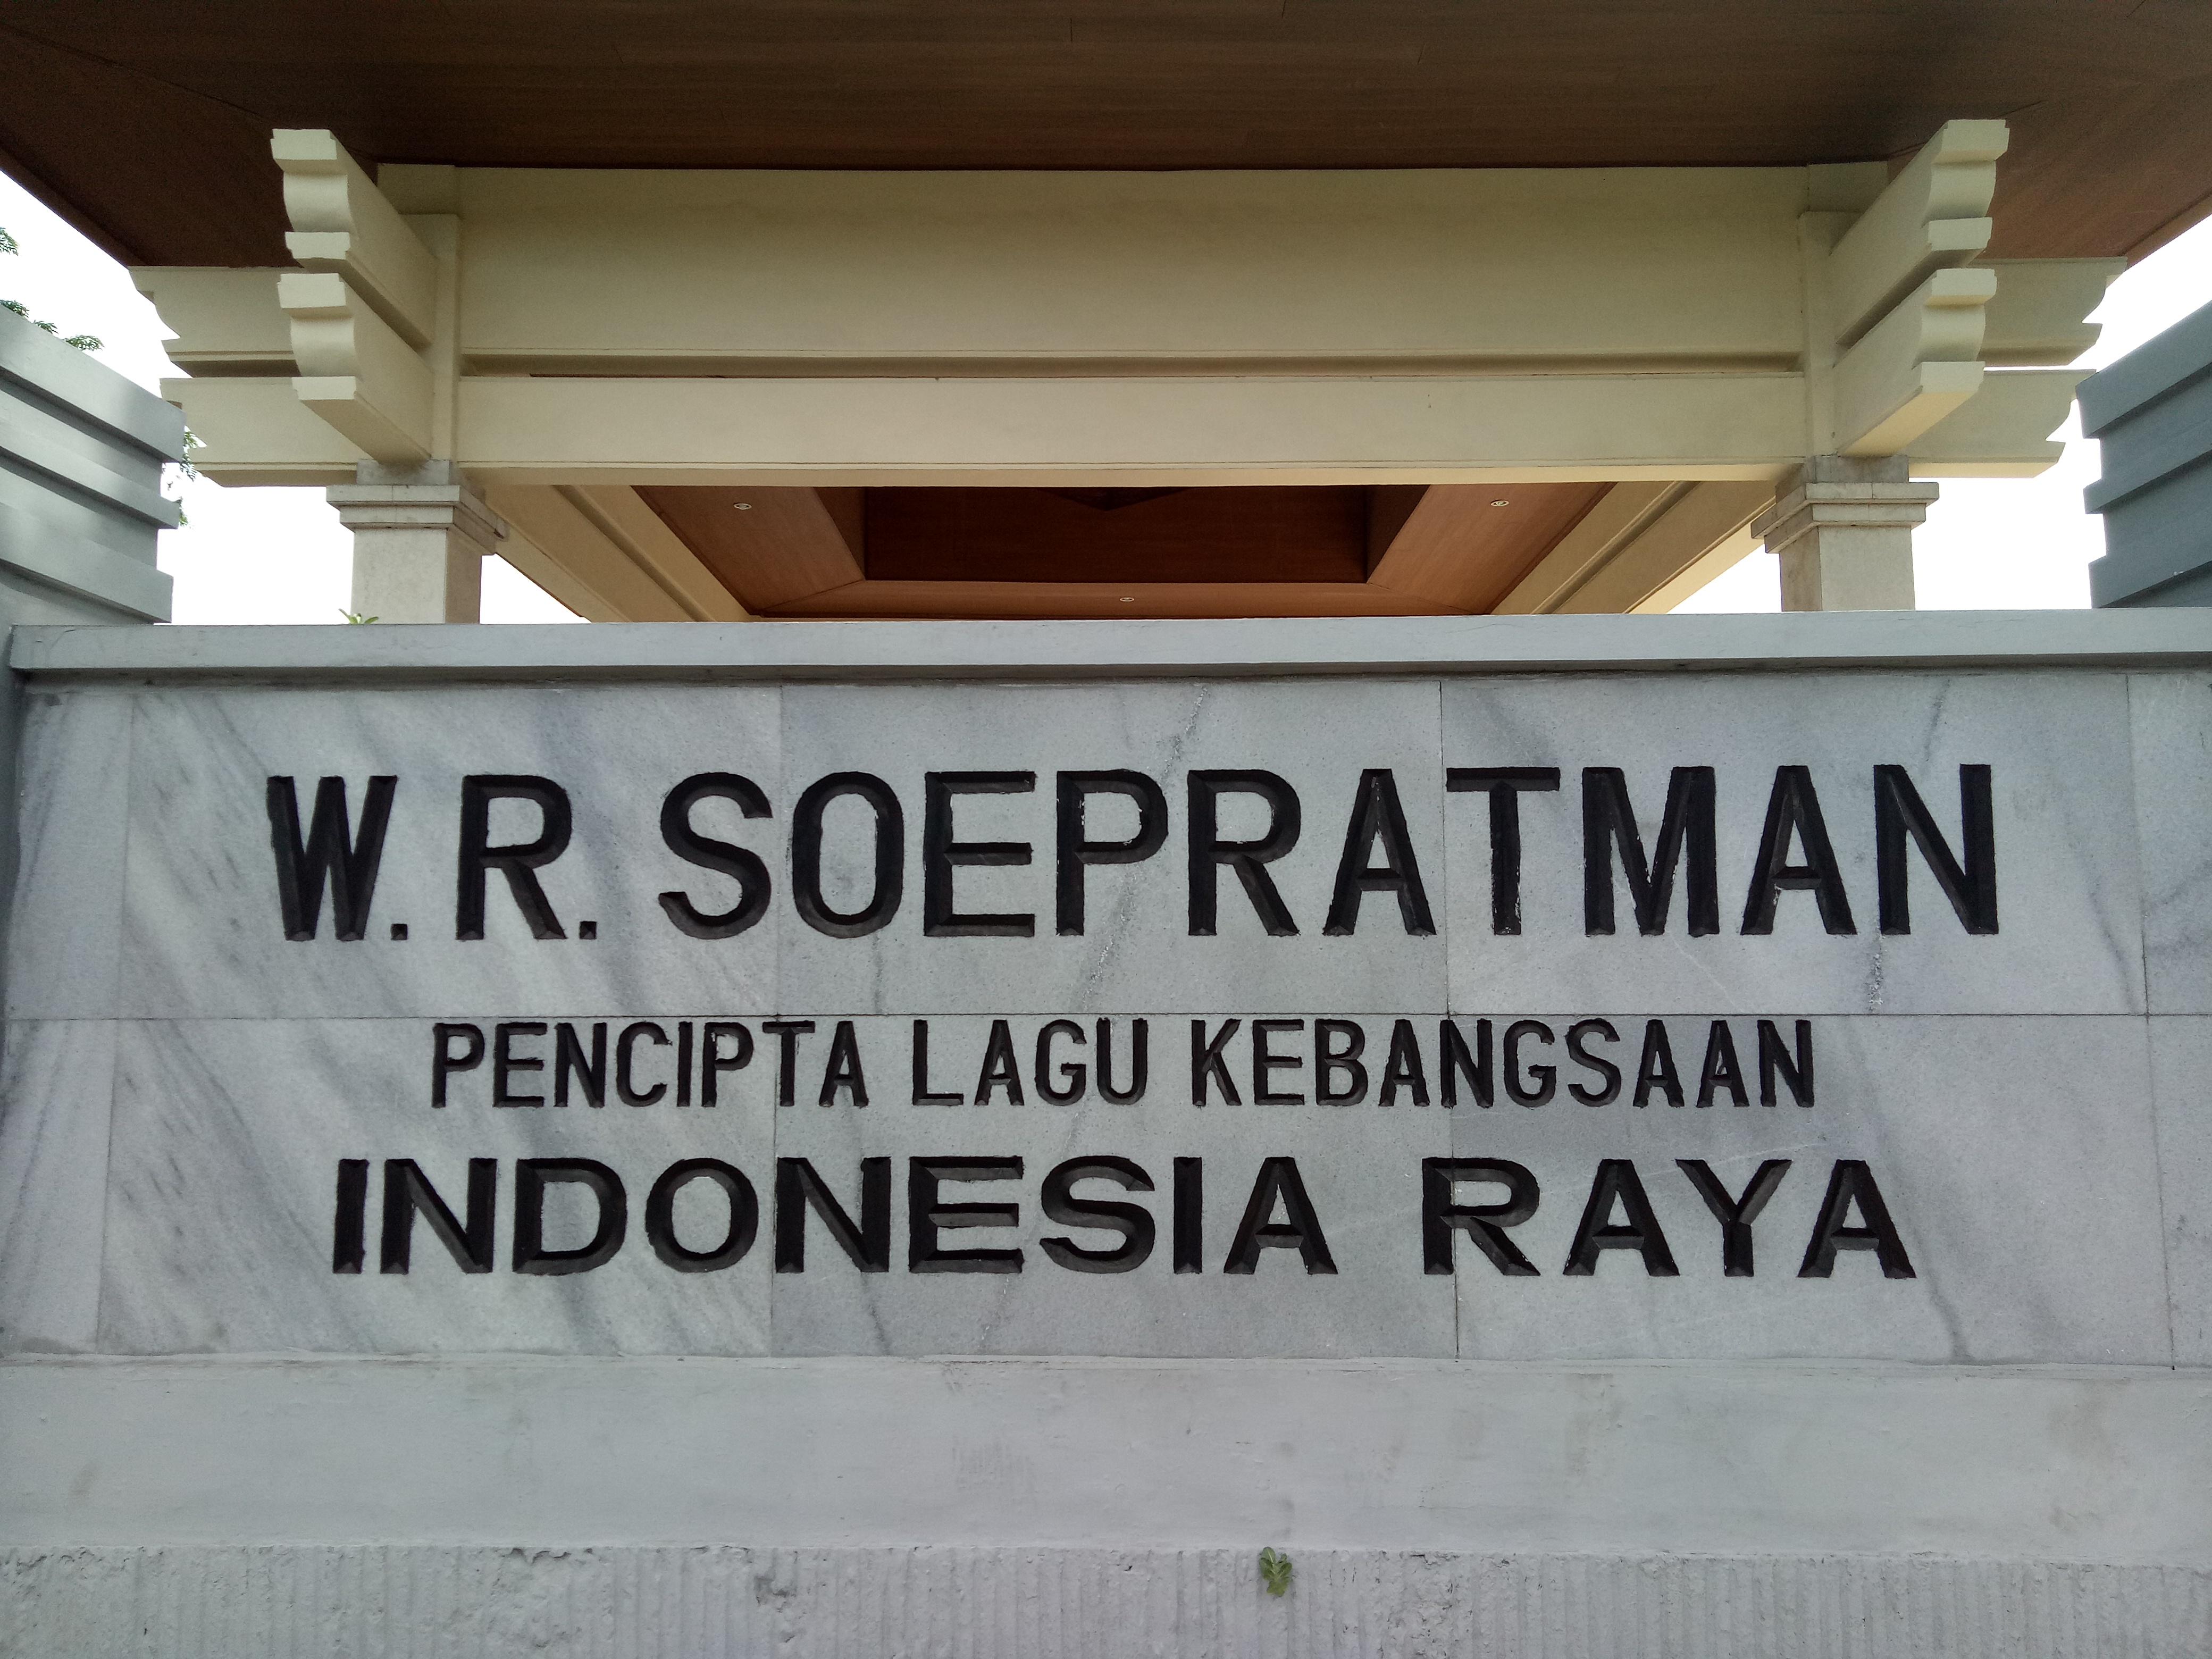 Menengok Makam Wr Soepratman Surabaya Papan Nama Foto Michelle Alda